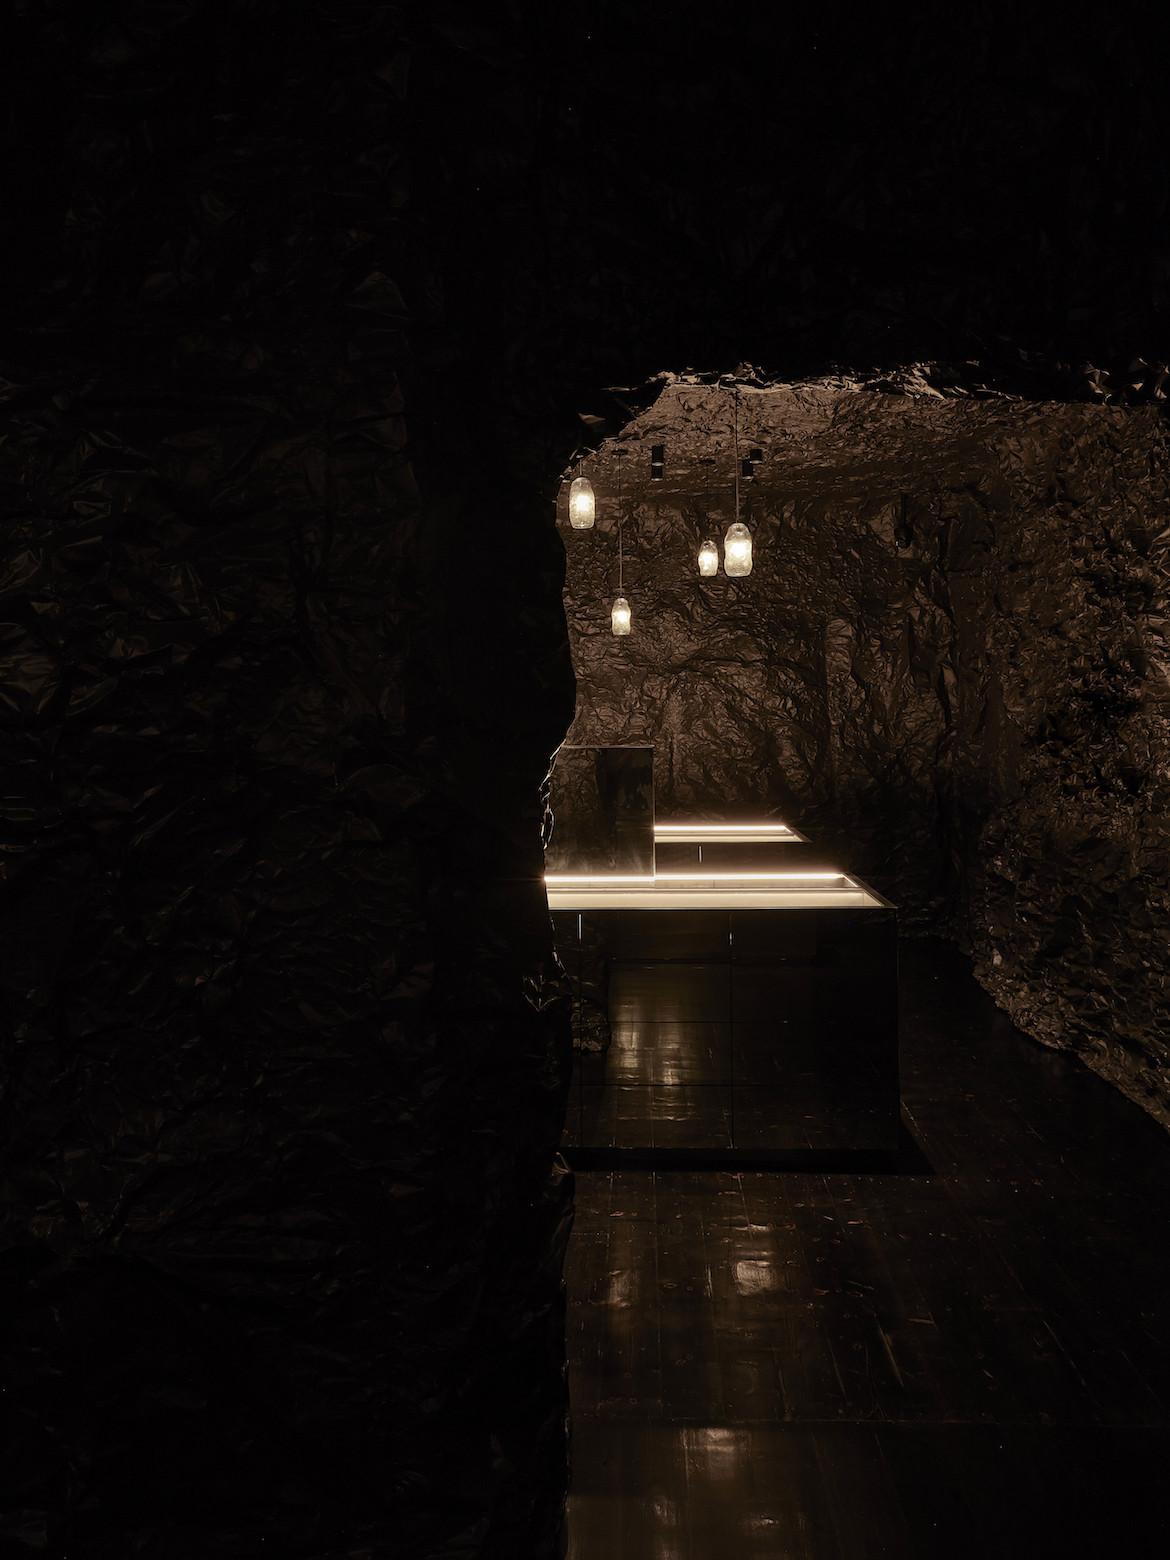 A dark cave-like hallway with black rippling walls leading to Sarah & Sebastian jewellery displays.